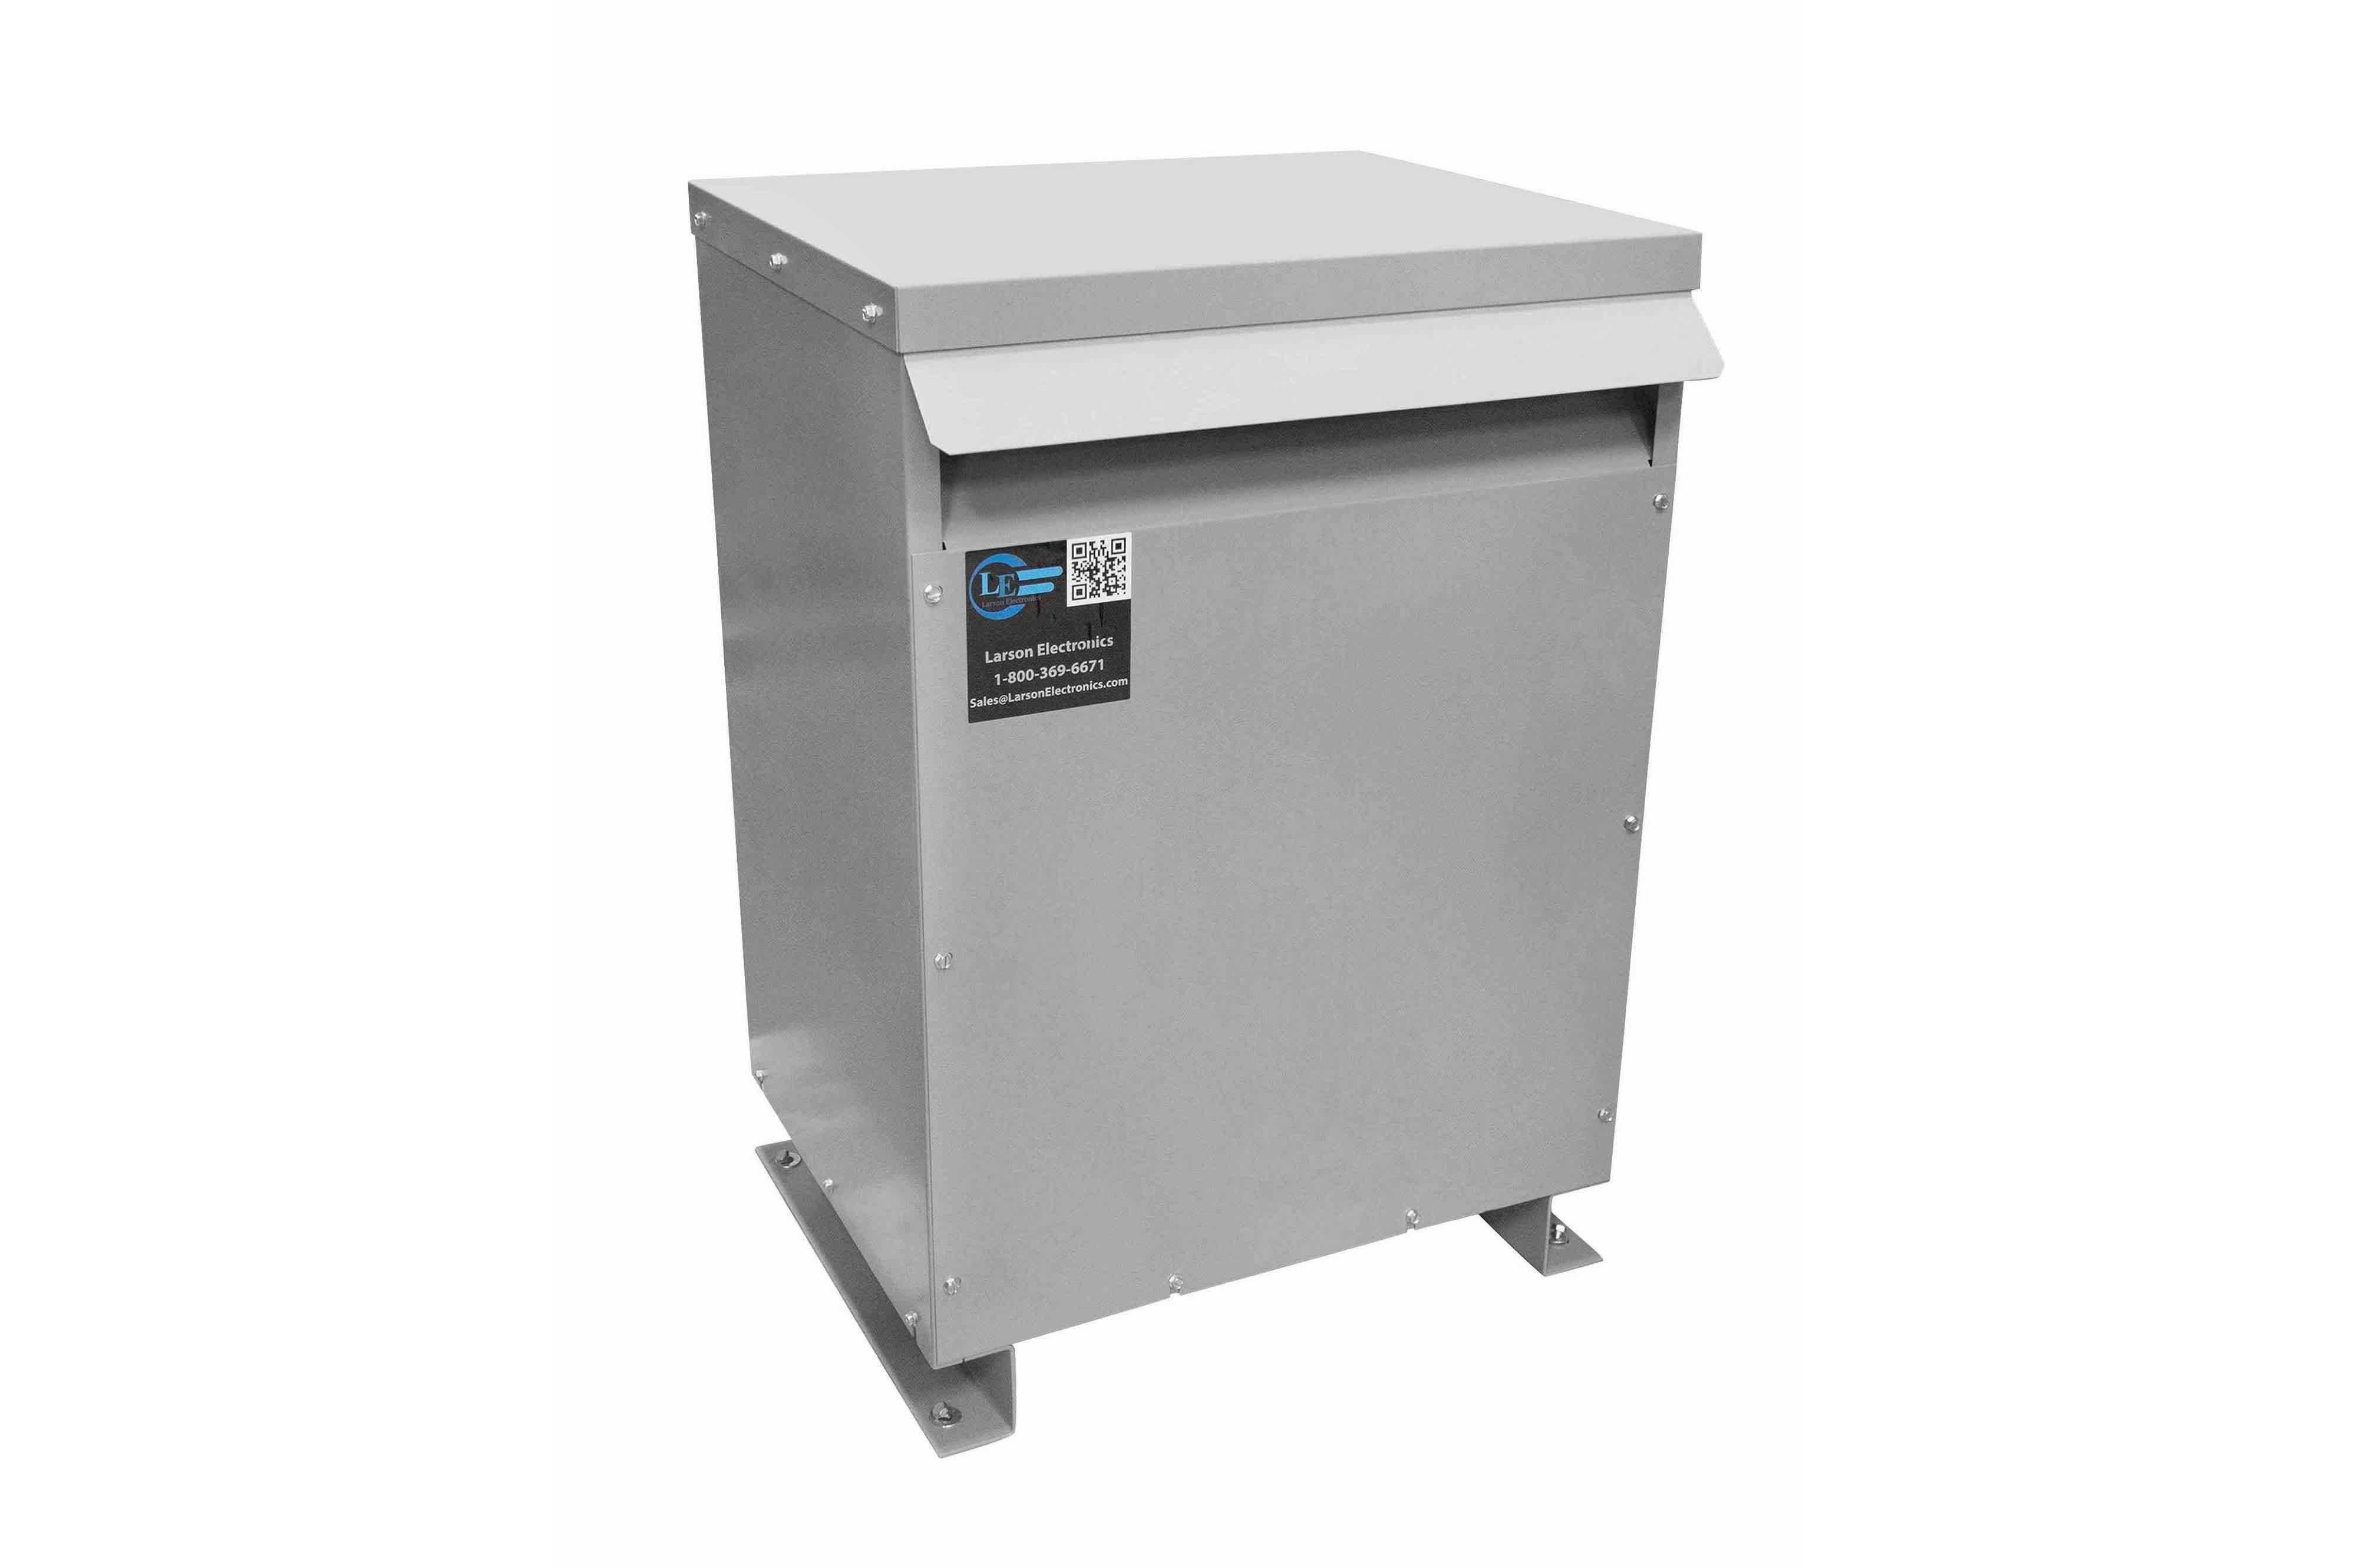 200 kVA 3PH Isolation Transformer, 208V Wye Primary, 400V Delta Secondary, N3R, Ventilated, 60 Hz